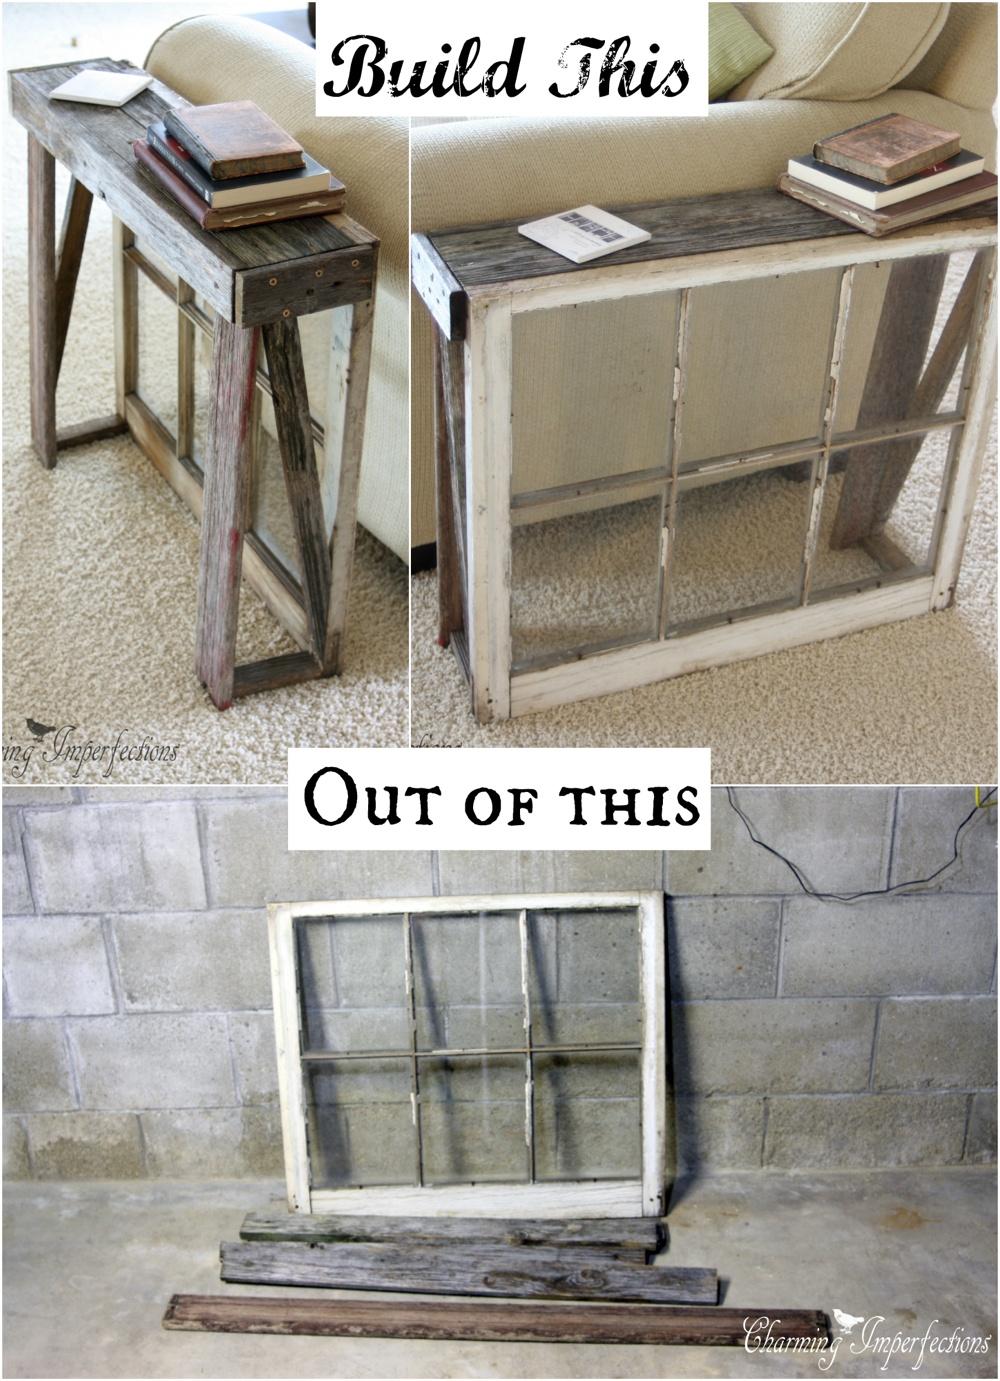 17 Brilliant Ways To Repurpose Old Windows Homelovr